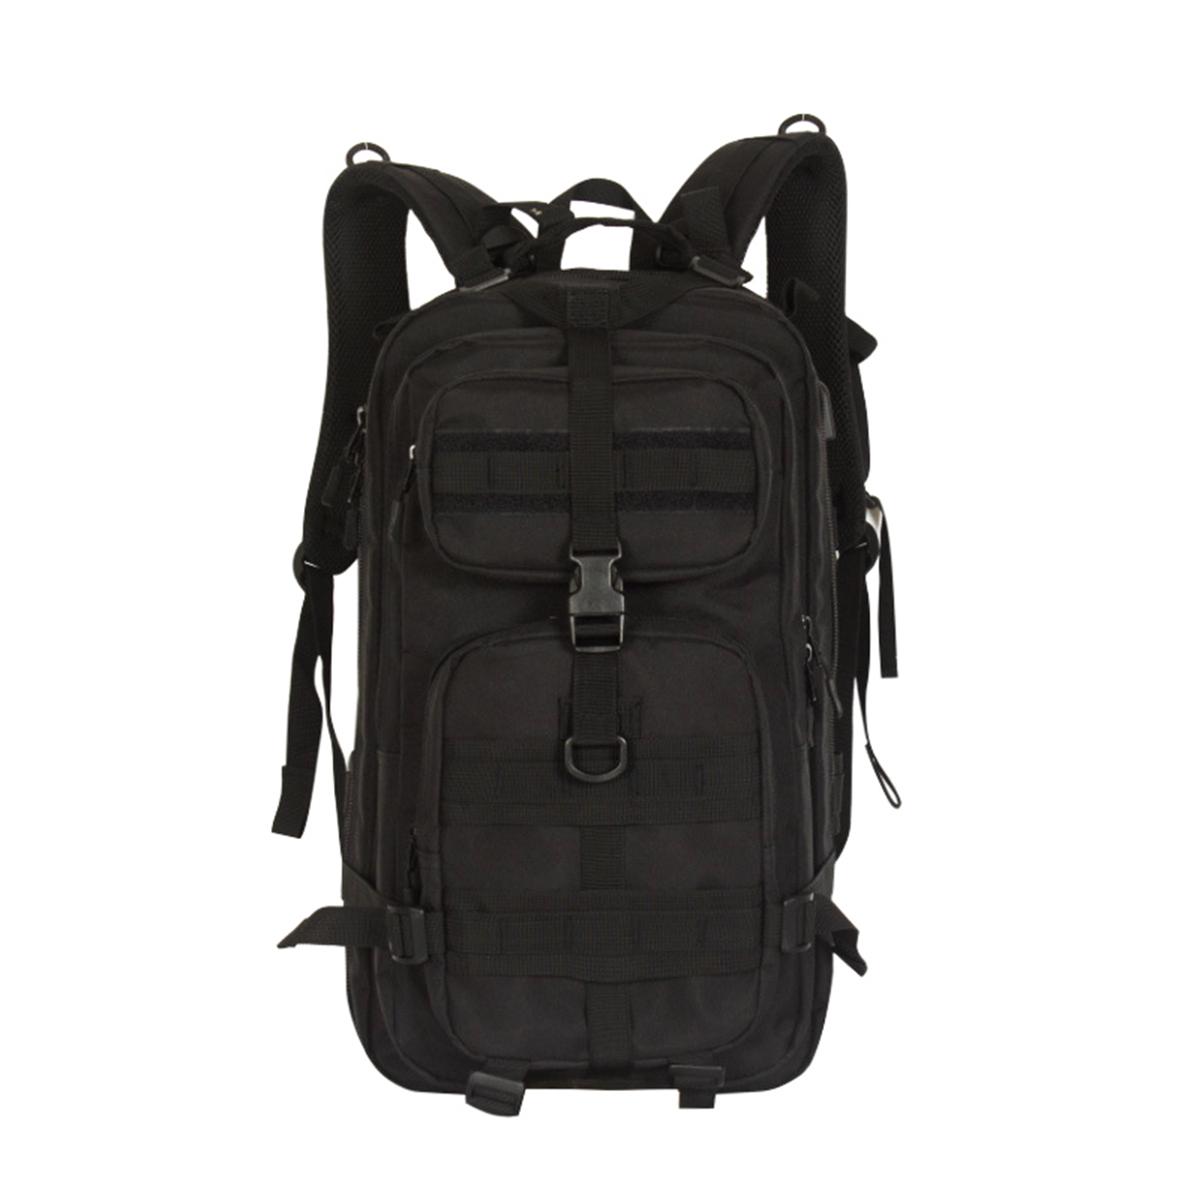 7f99bda2b Waterproof Tactical Laptop Backpack- Fenix Toulouse Handball